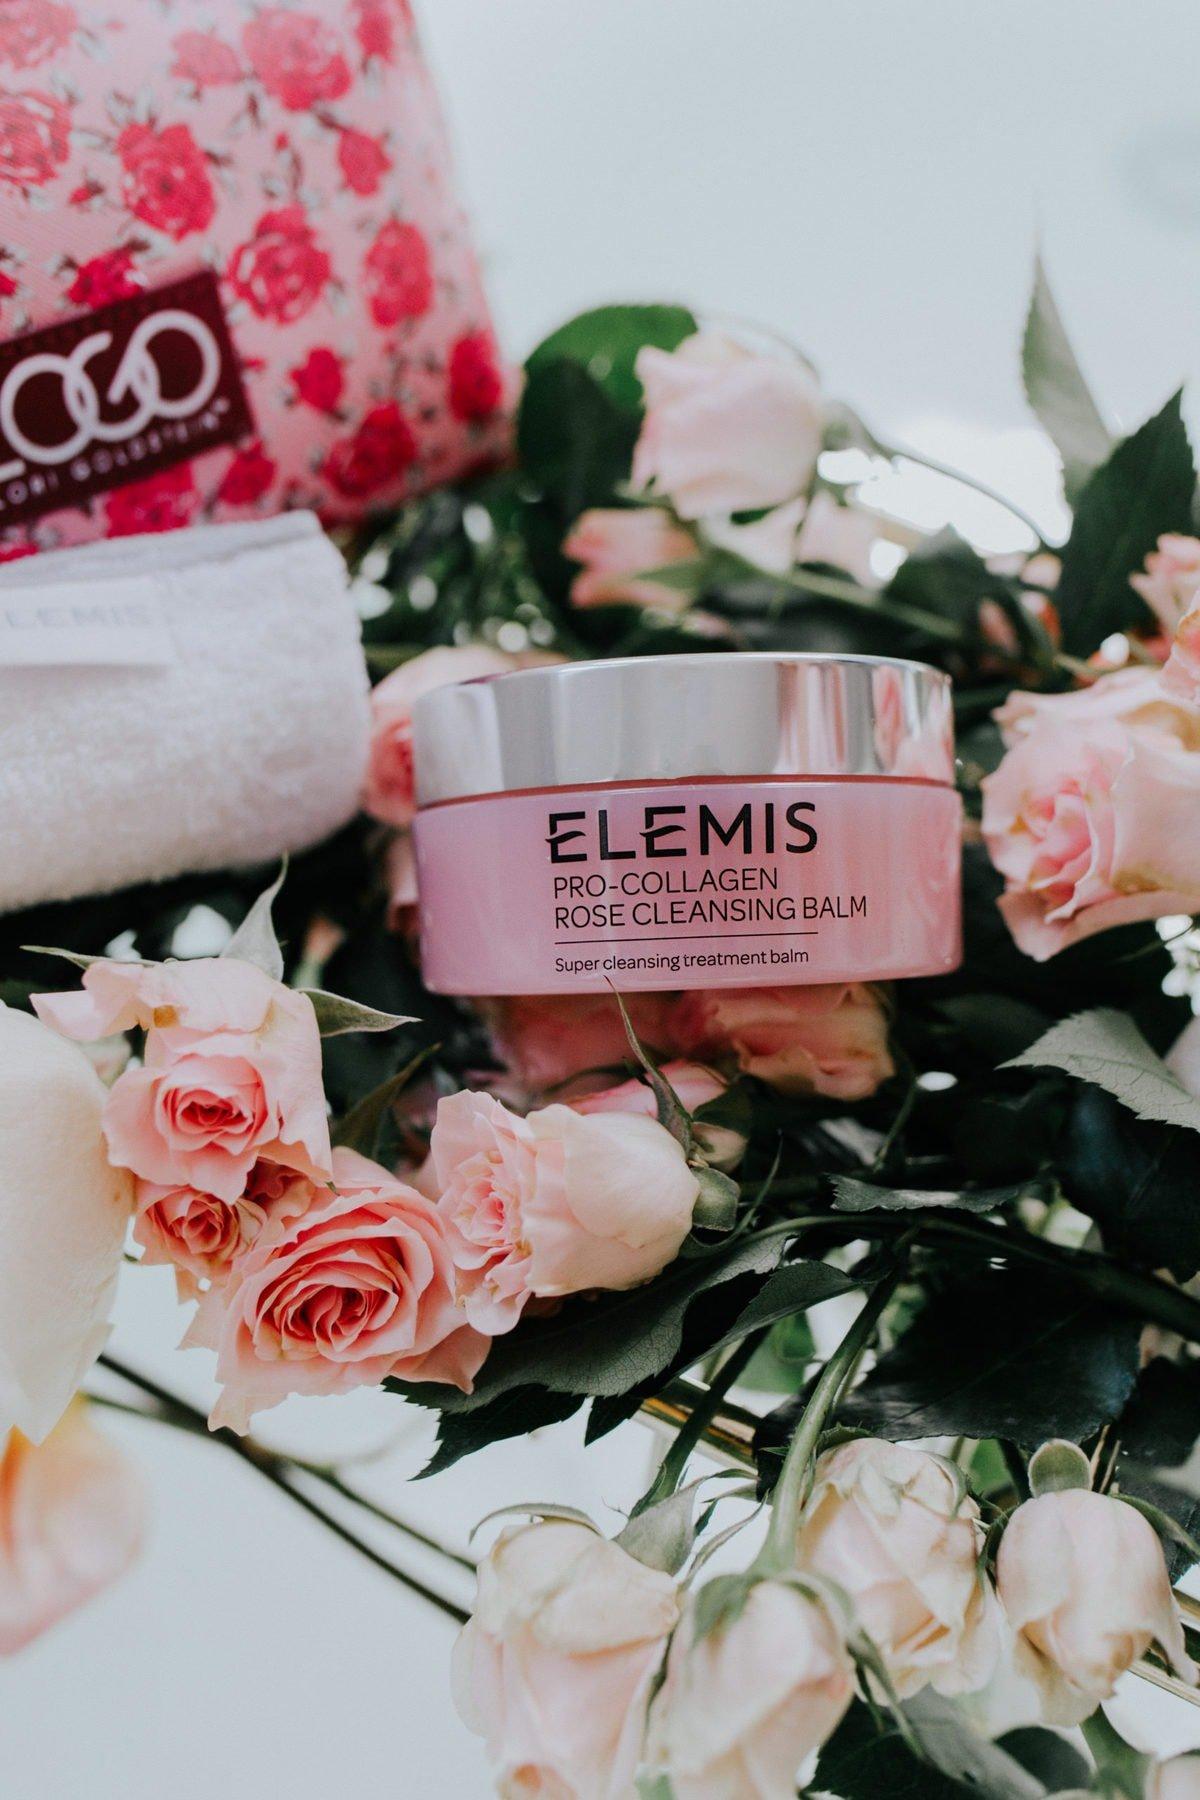 rose cleansing balm